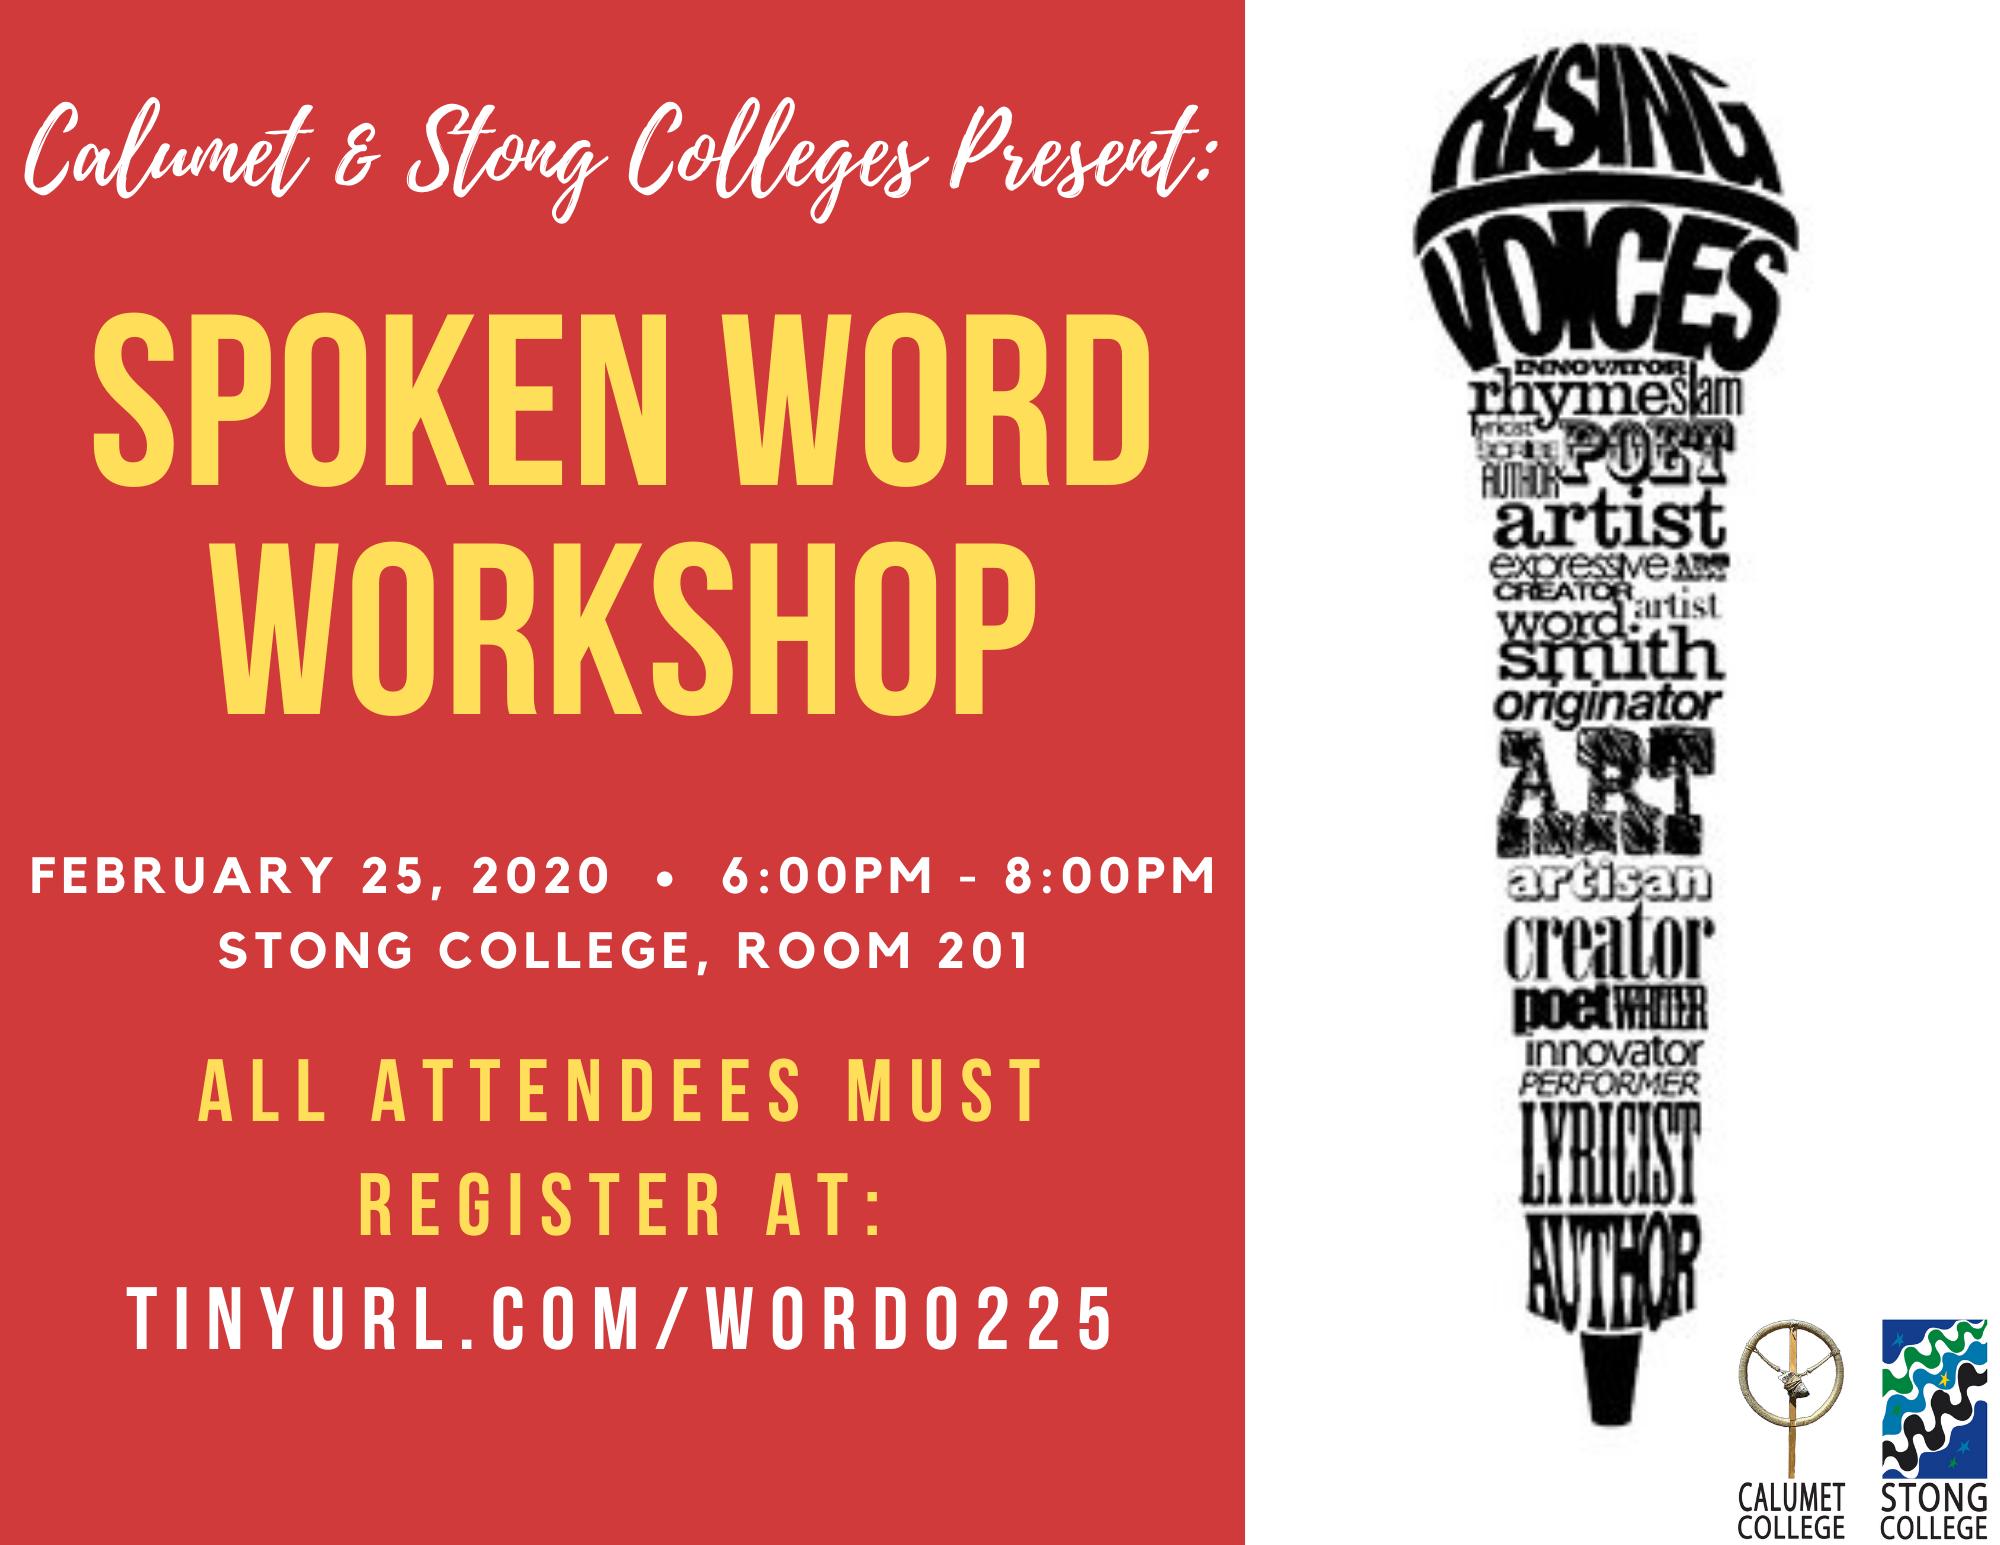 Spoken Word Workshop @ Stong College, Room 201